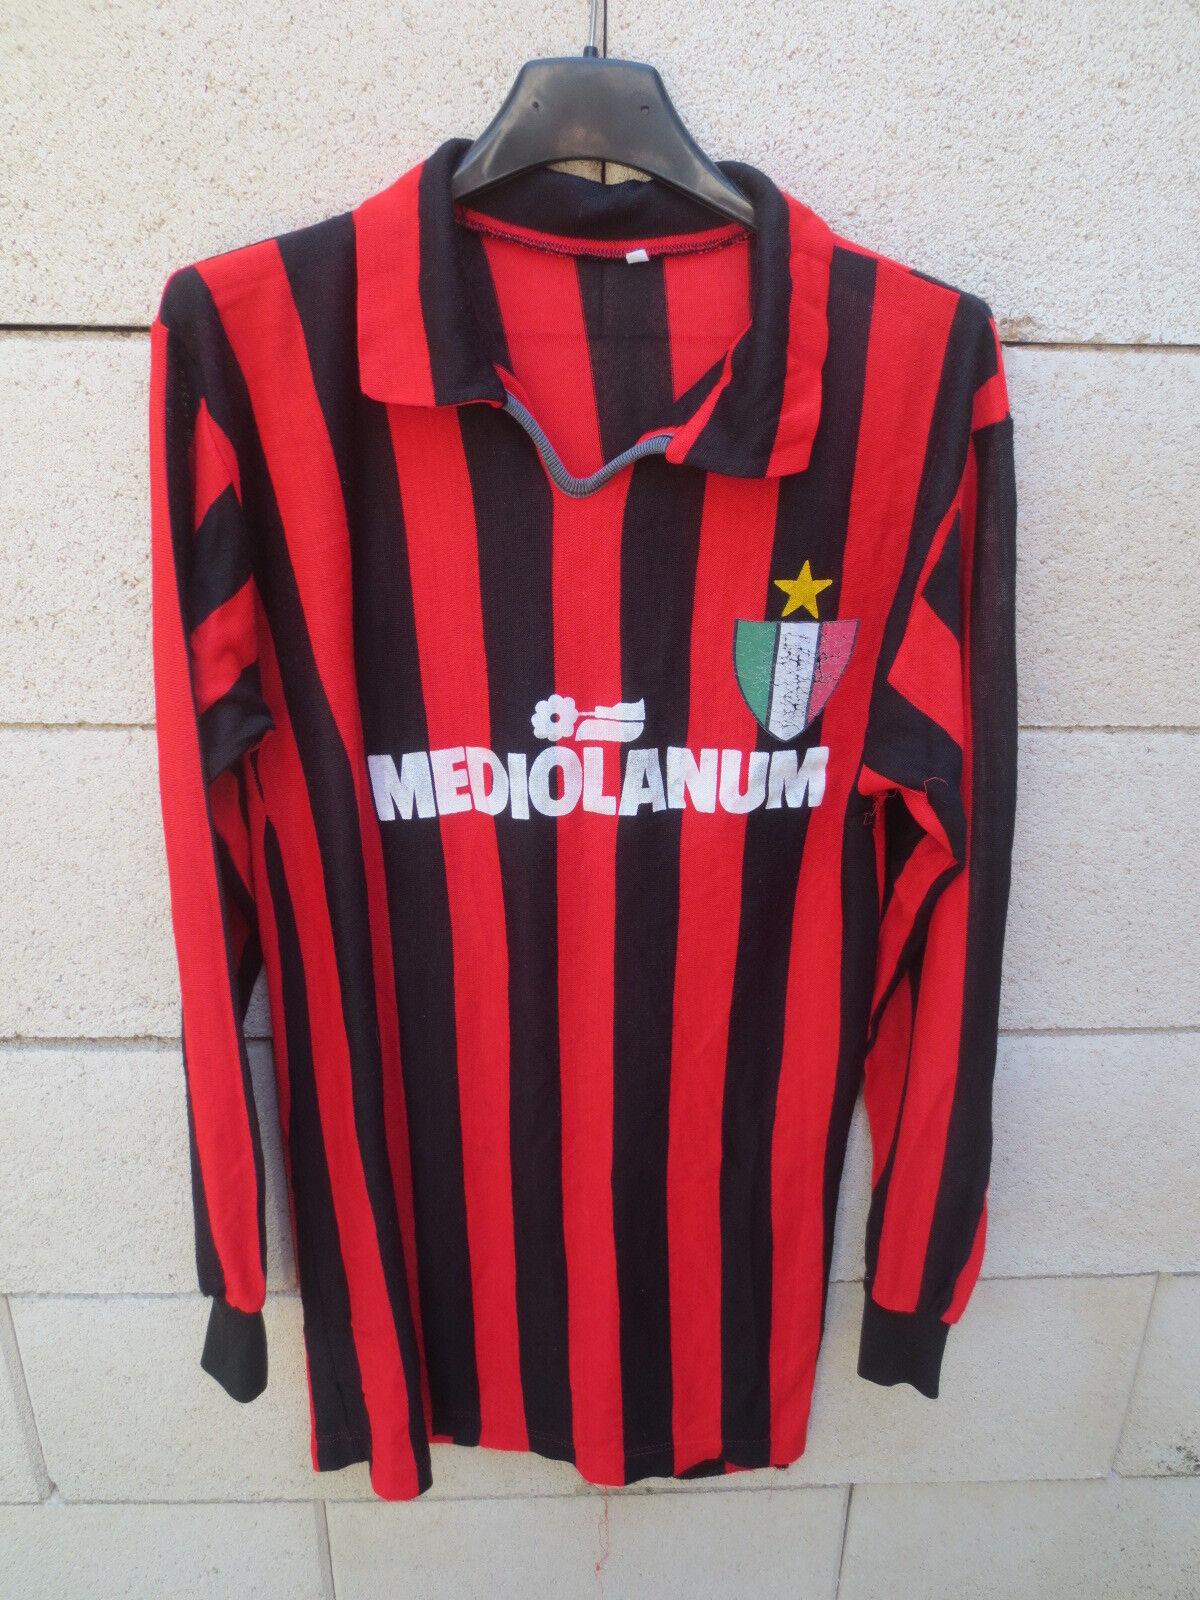 VINTAGE Maillot MILAN AC 1989 MEDIOLANUM maglia calcio football ancien shirt M